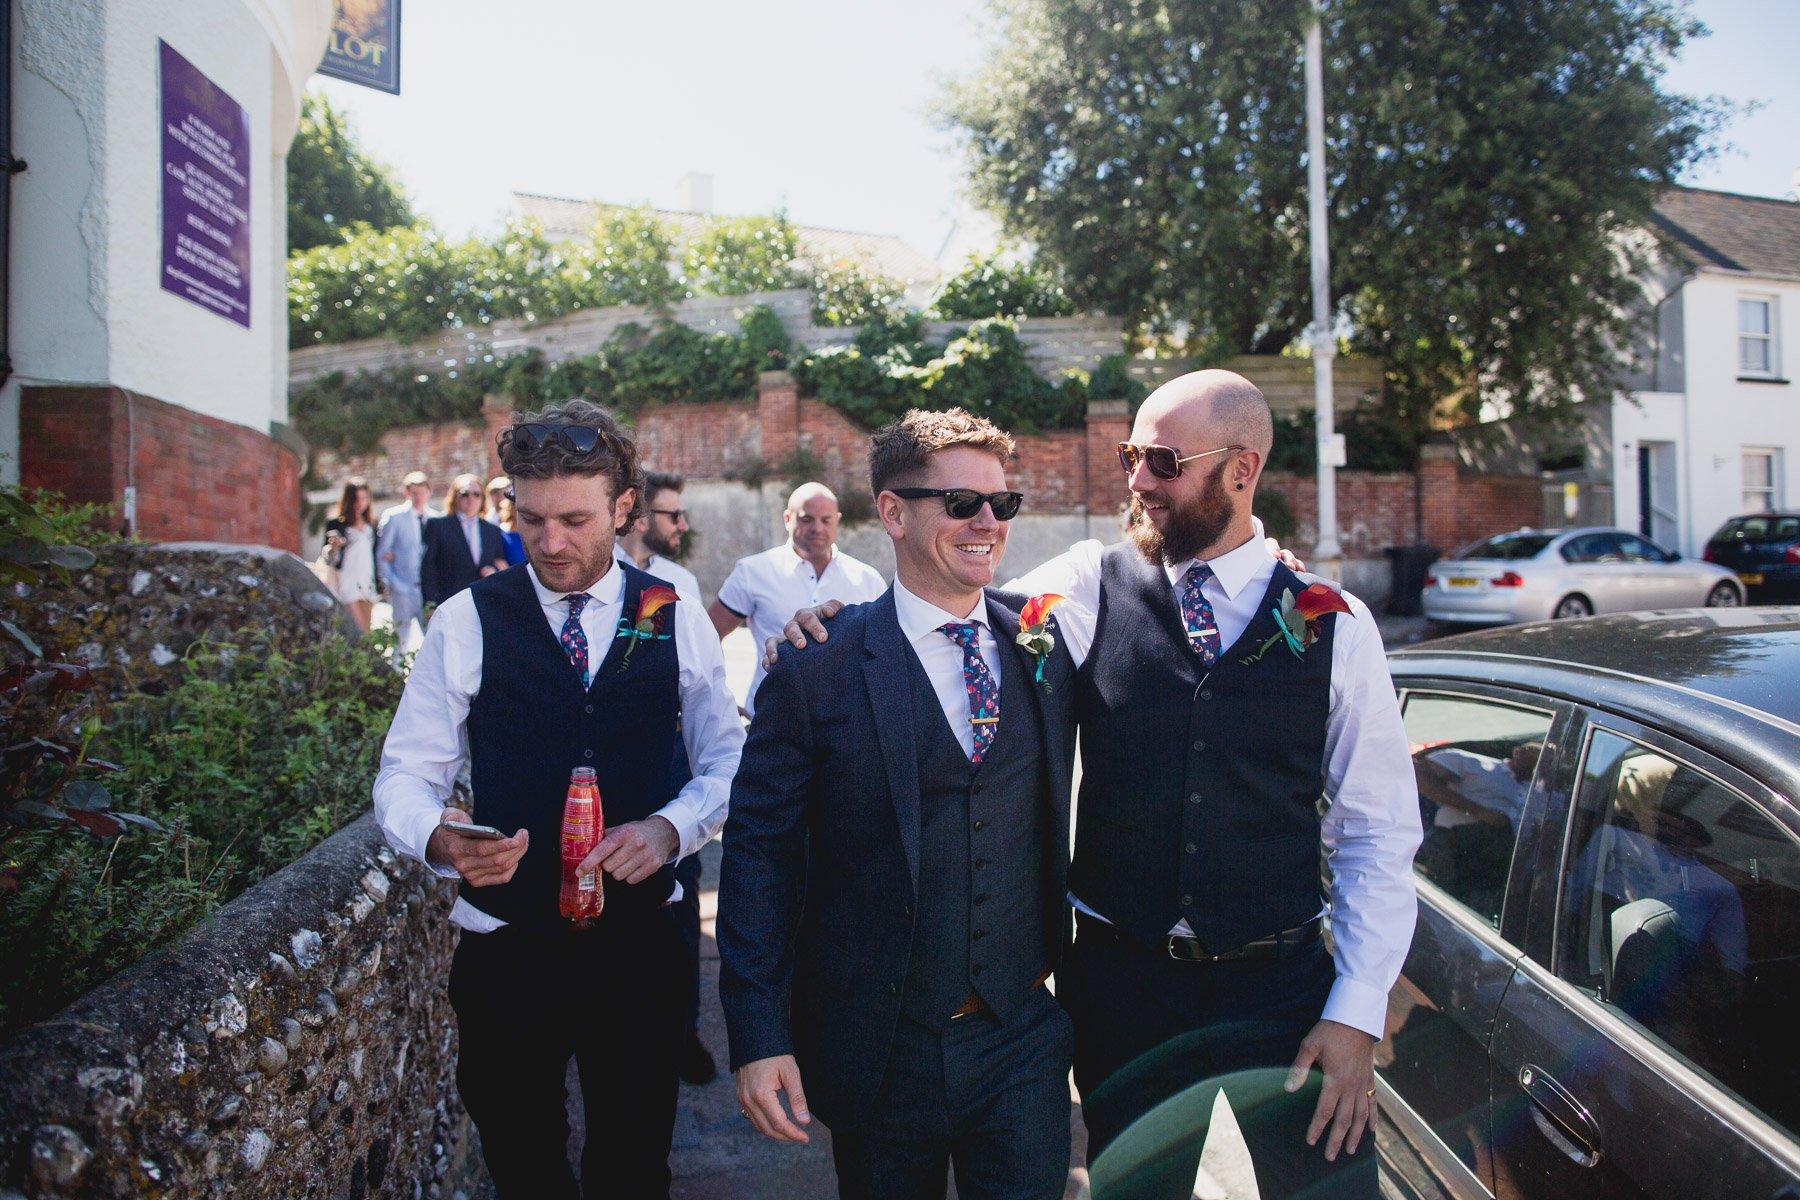 eastbourne-wedding-photography-hannah-tom-010